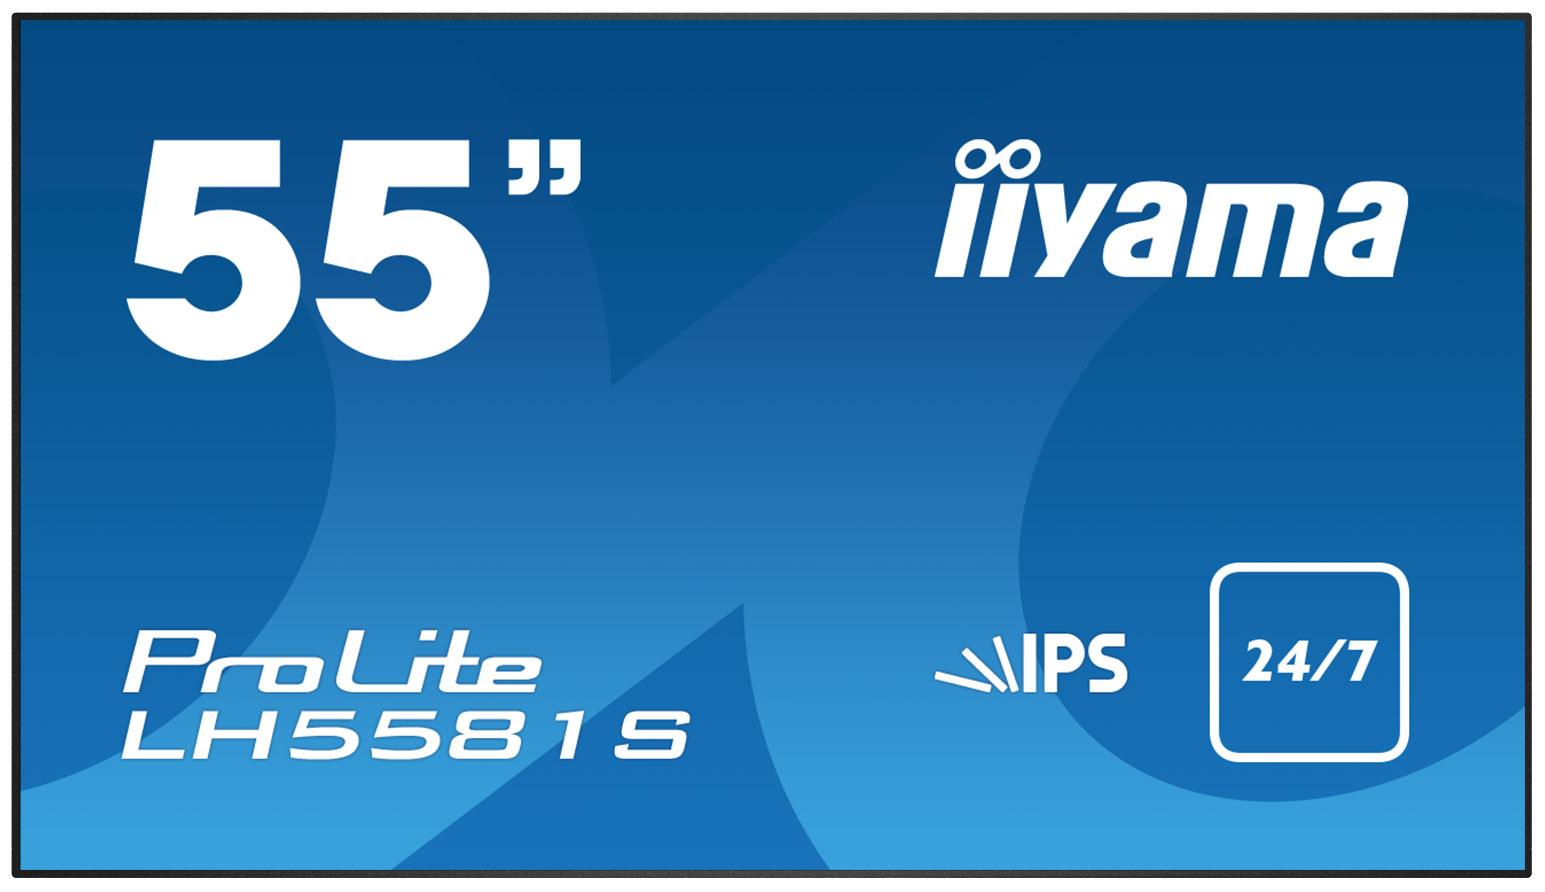 "55"" LCD iiyama ProLite LH5581S-B1 -FullHD,IPS,8ms,500cd,USB media player,RJ45,RS232C,repro,OPS,24/7"